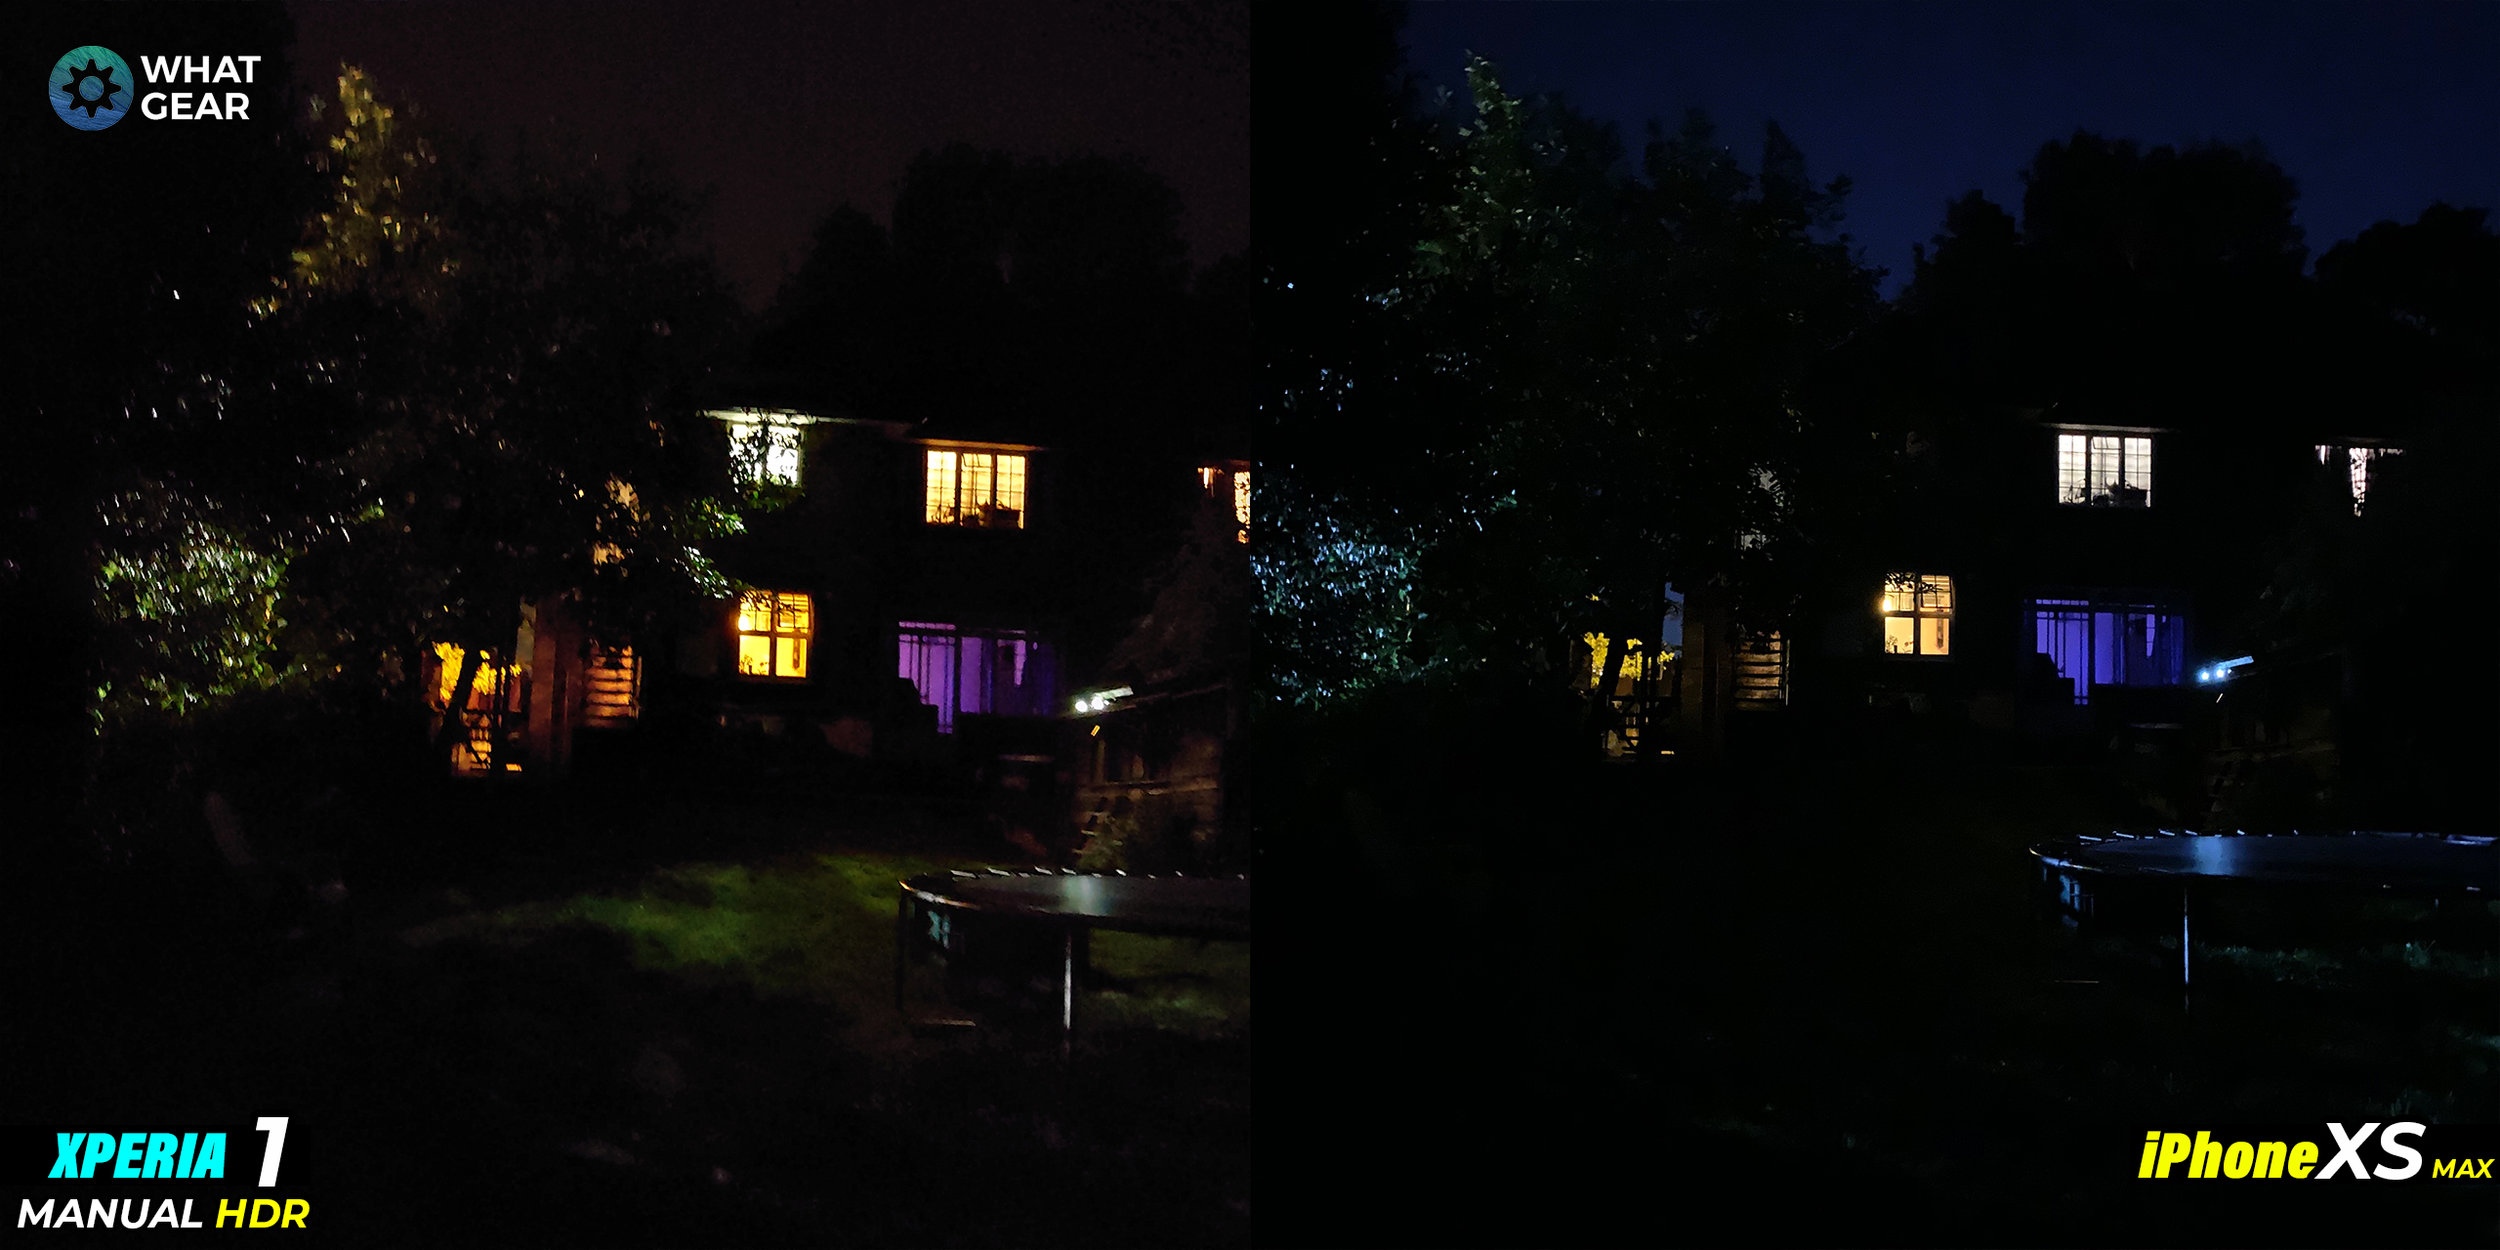 xperia 1 vs iphone xs camera 11.jpg